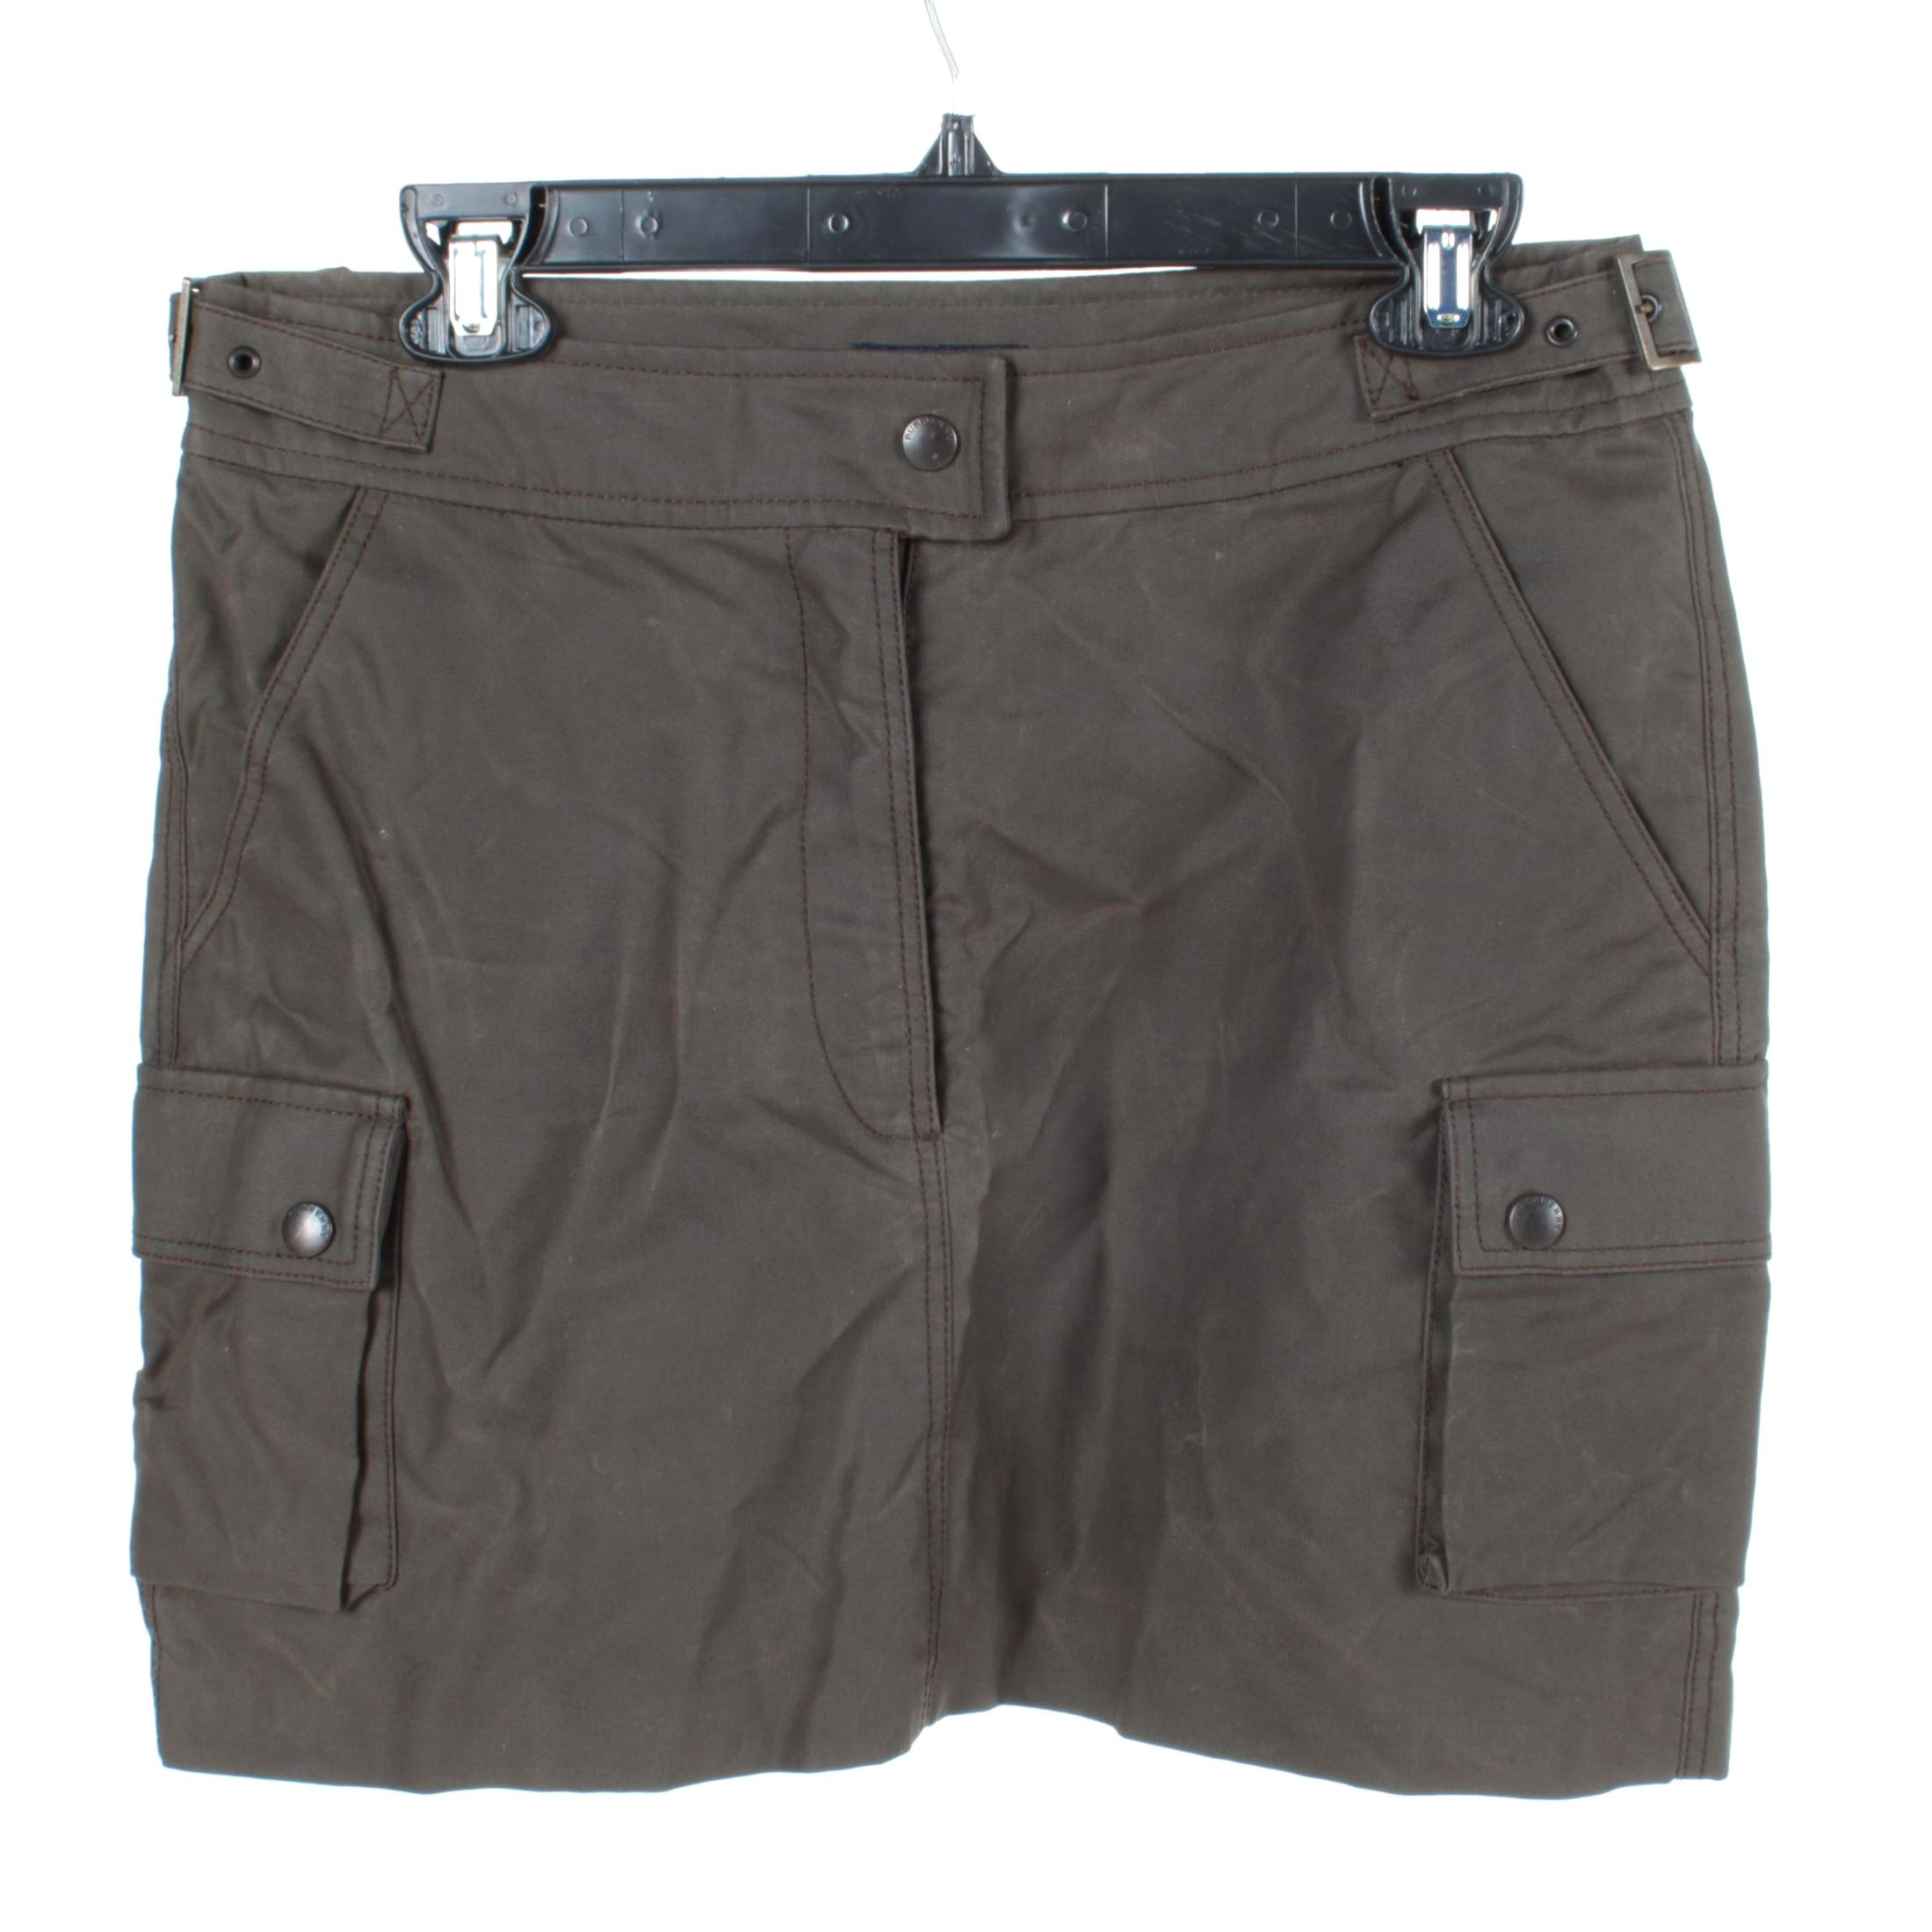 Burberry Cargo Skirt